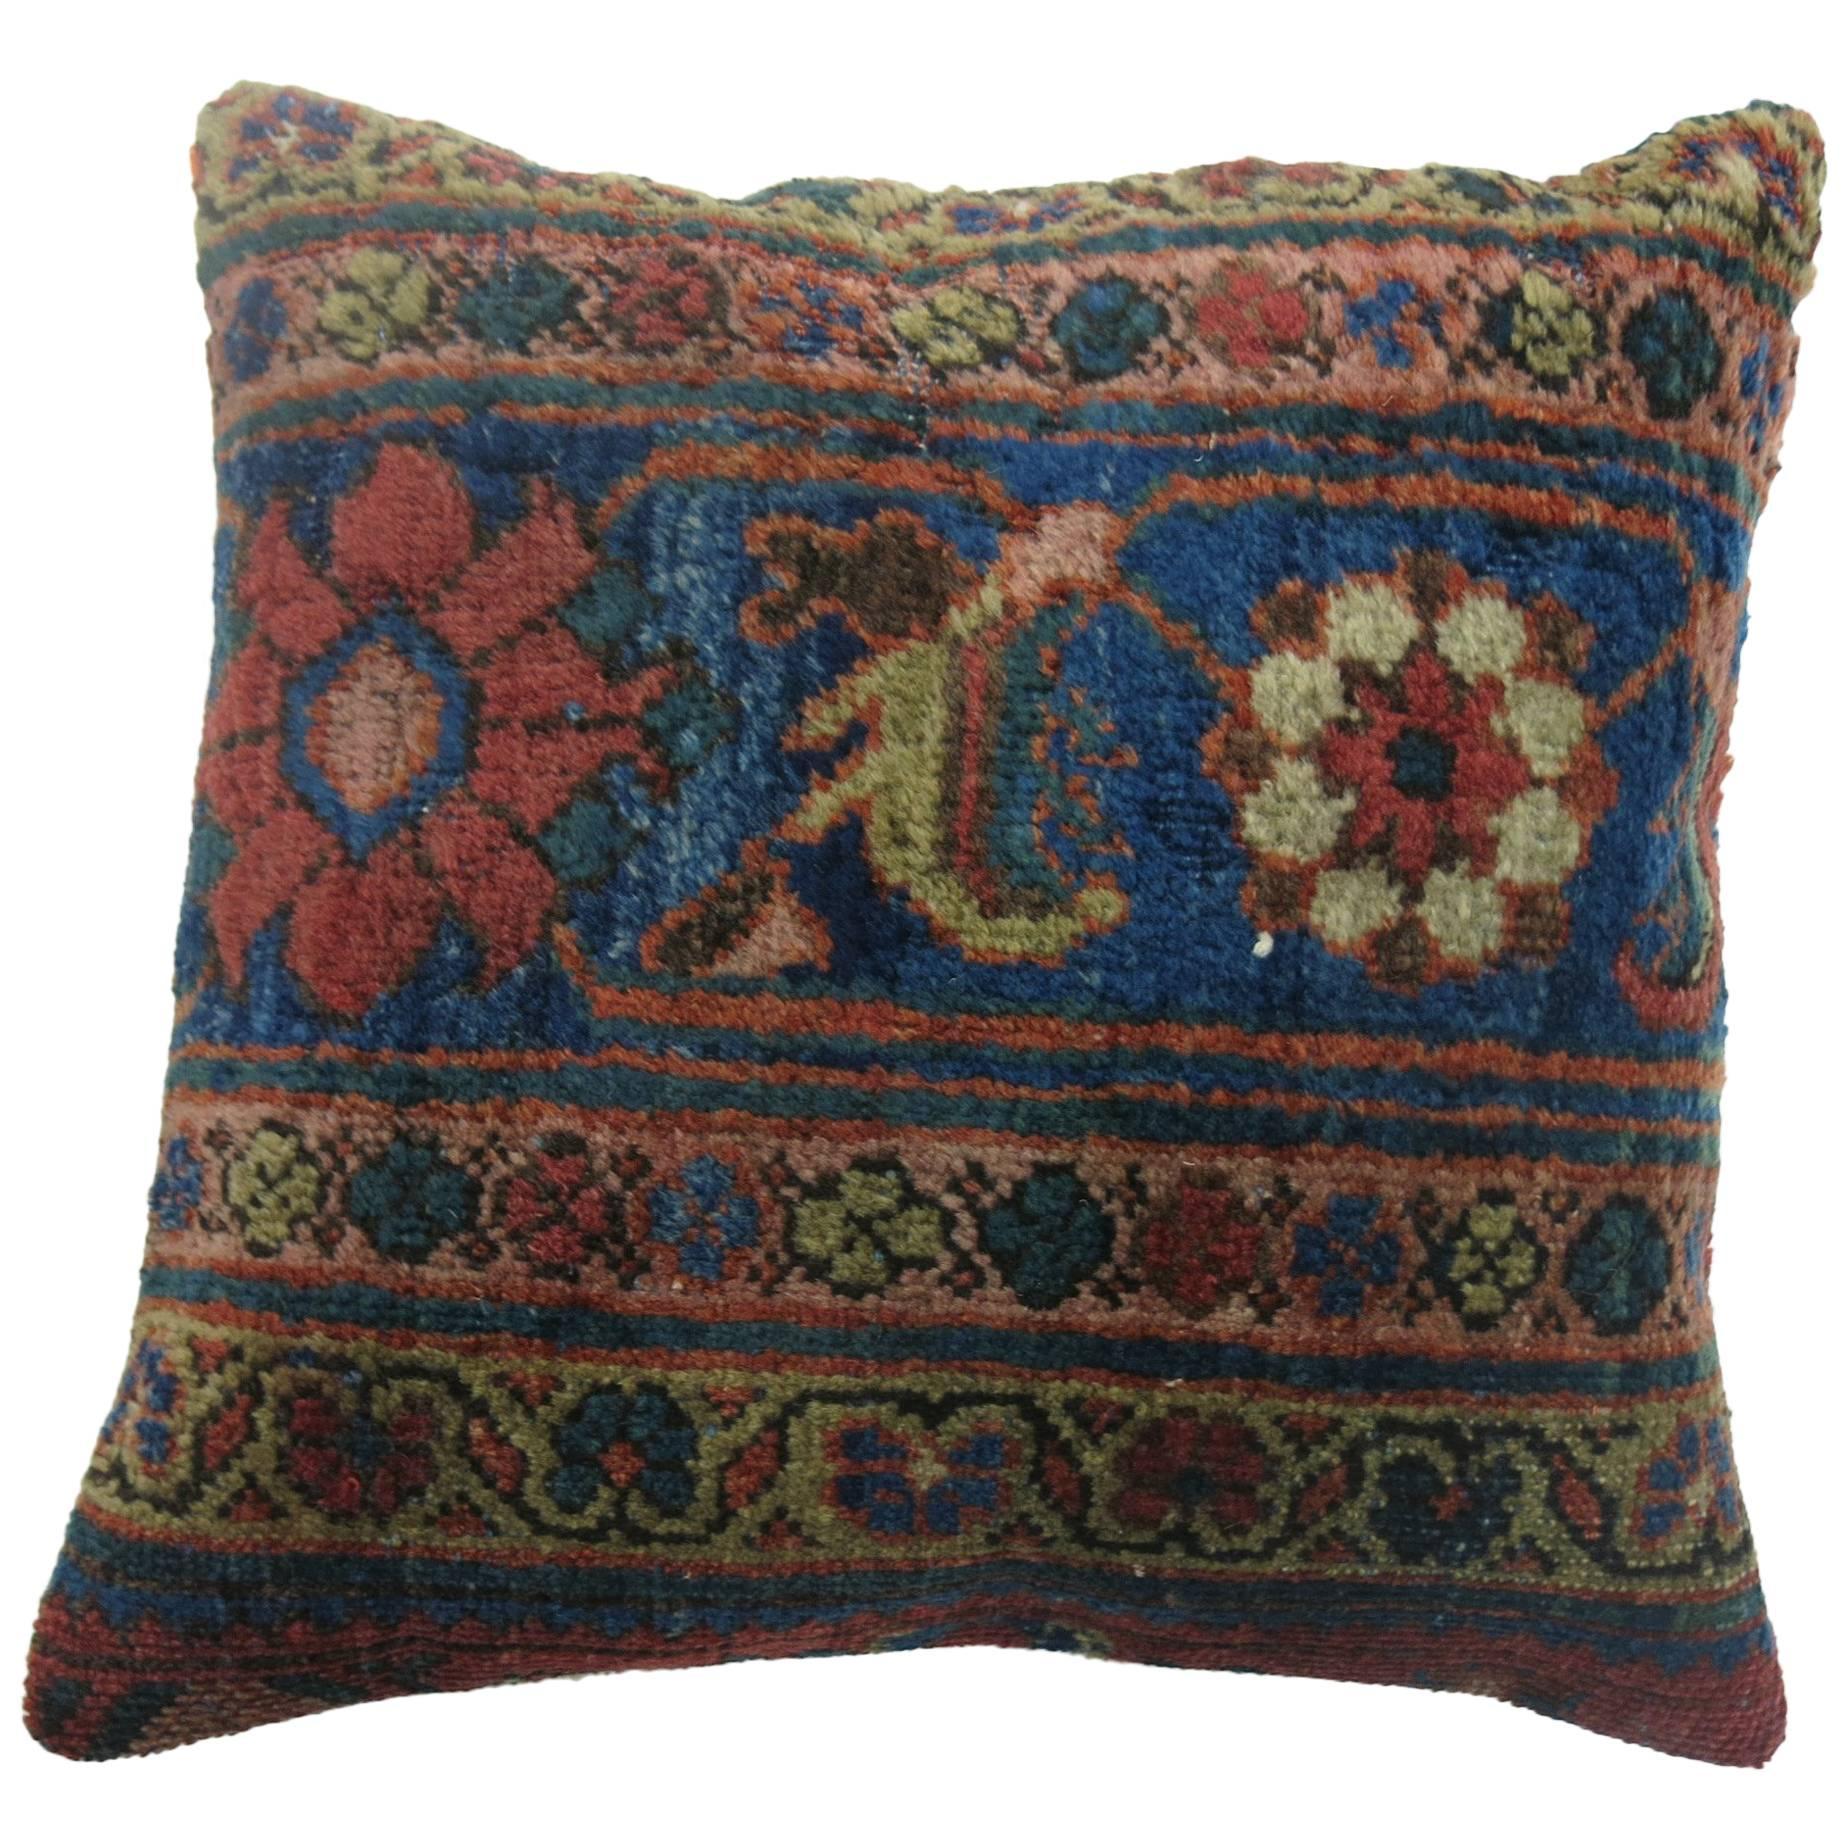 Antique Persian Mahal Distressed Border Rug Pillow